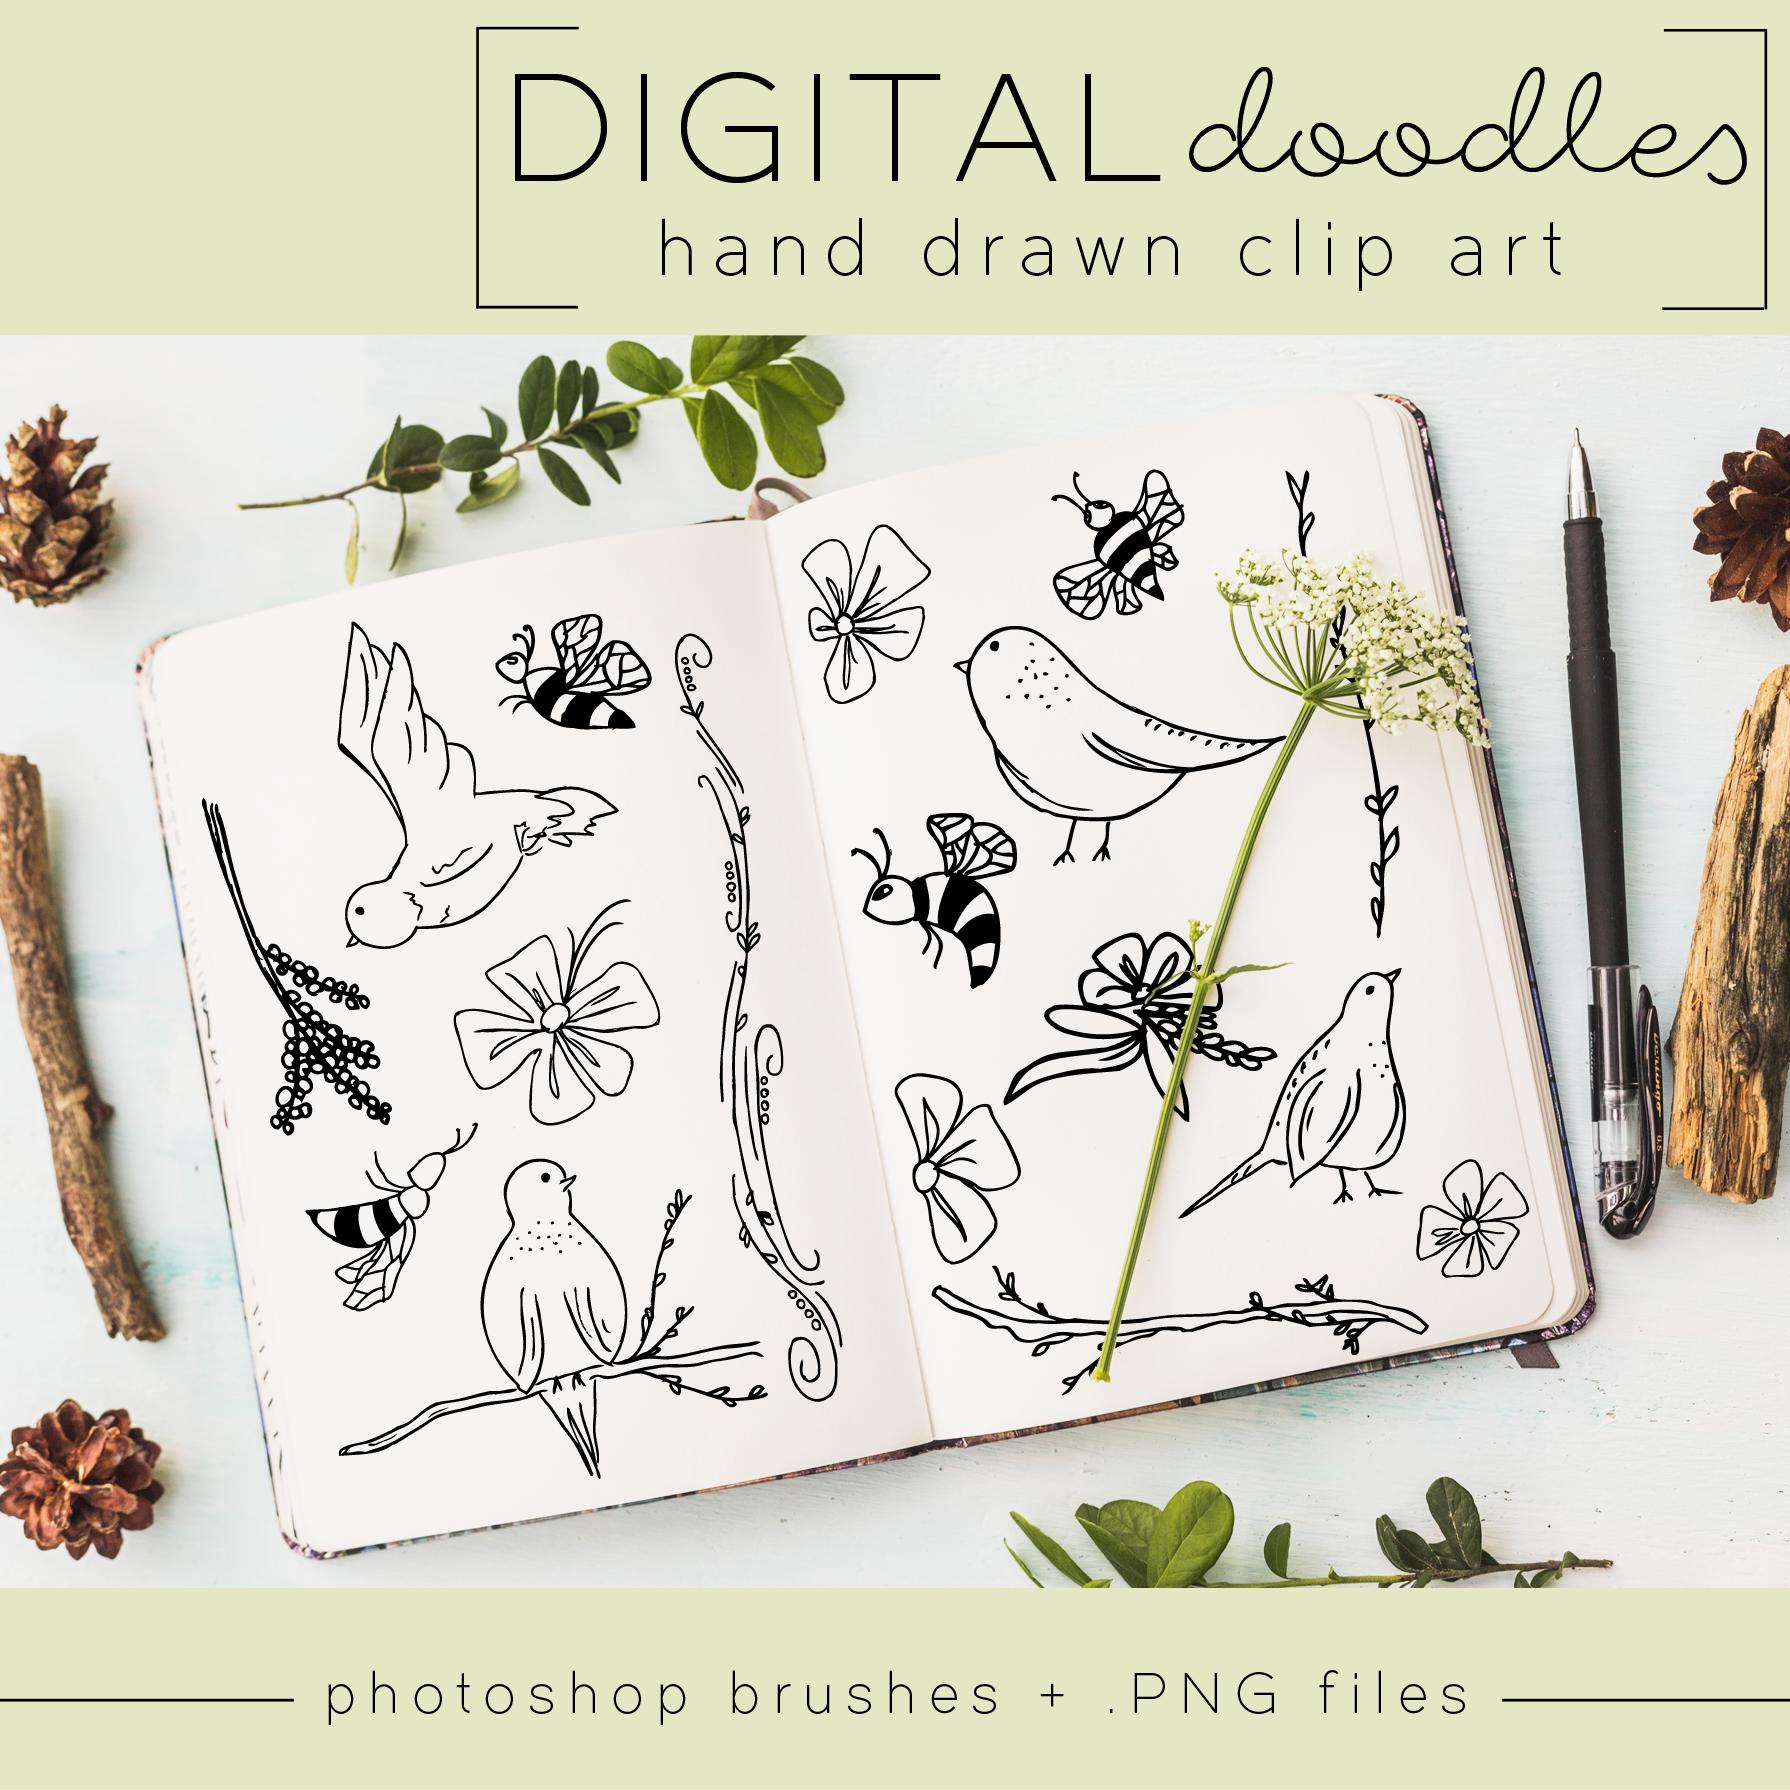 twgdesigns-handdrawn-doodle-clipart-art-illustration-digital-download-birds-bees-scrapbook-etsy-shop-boho-animals